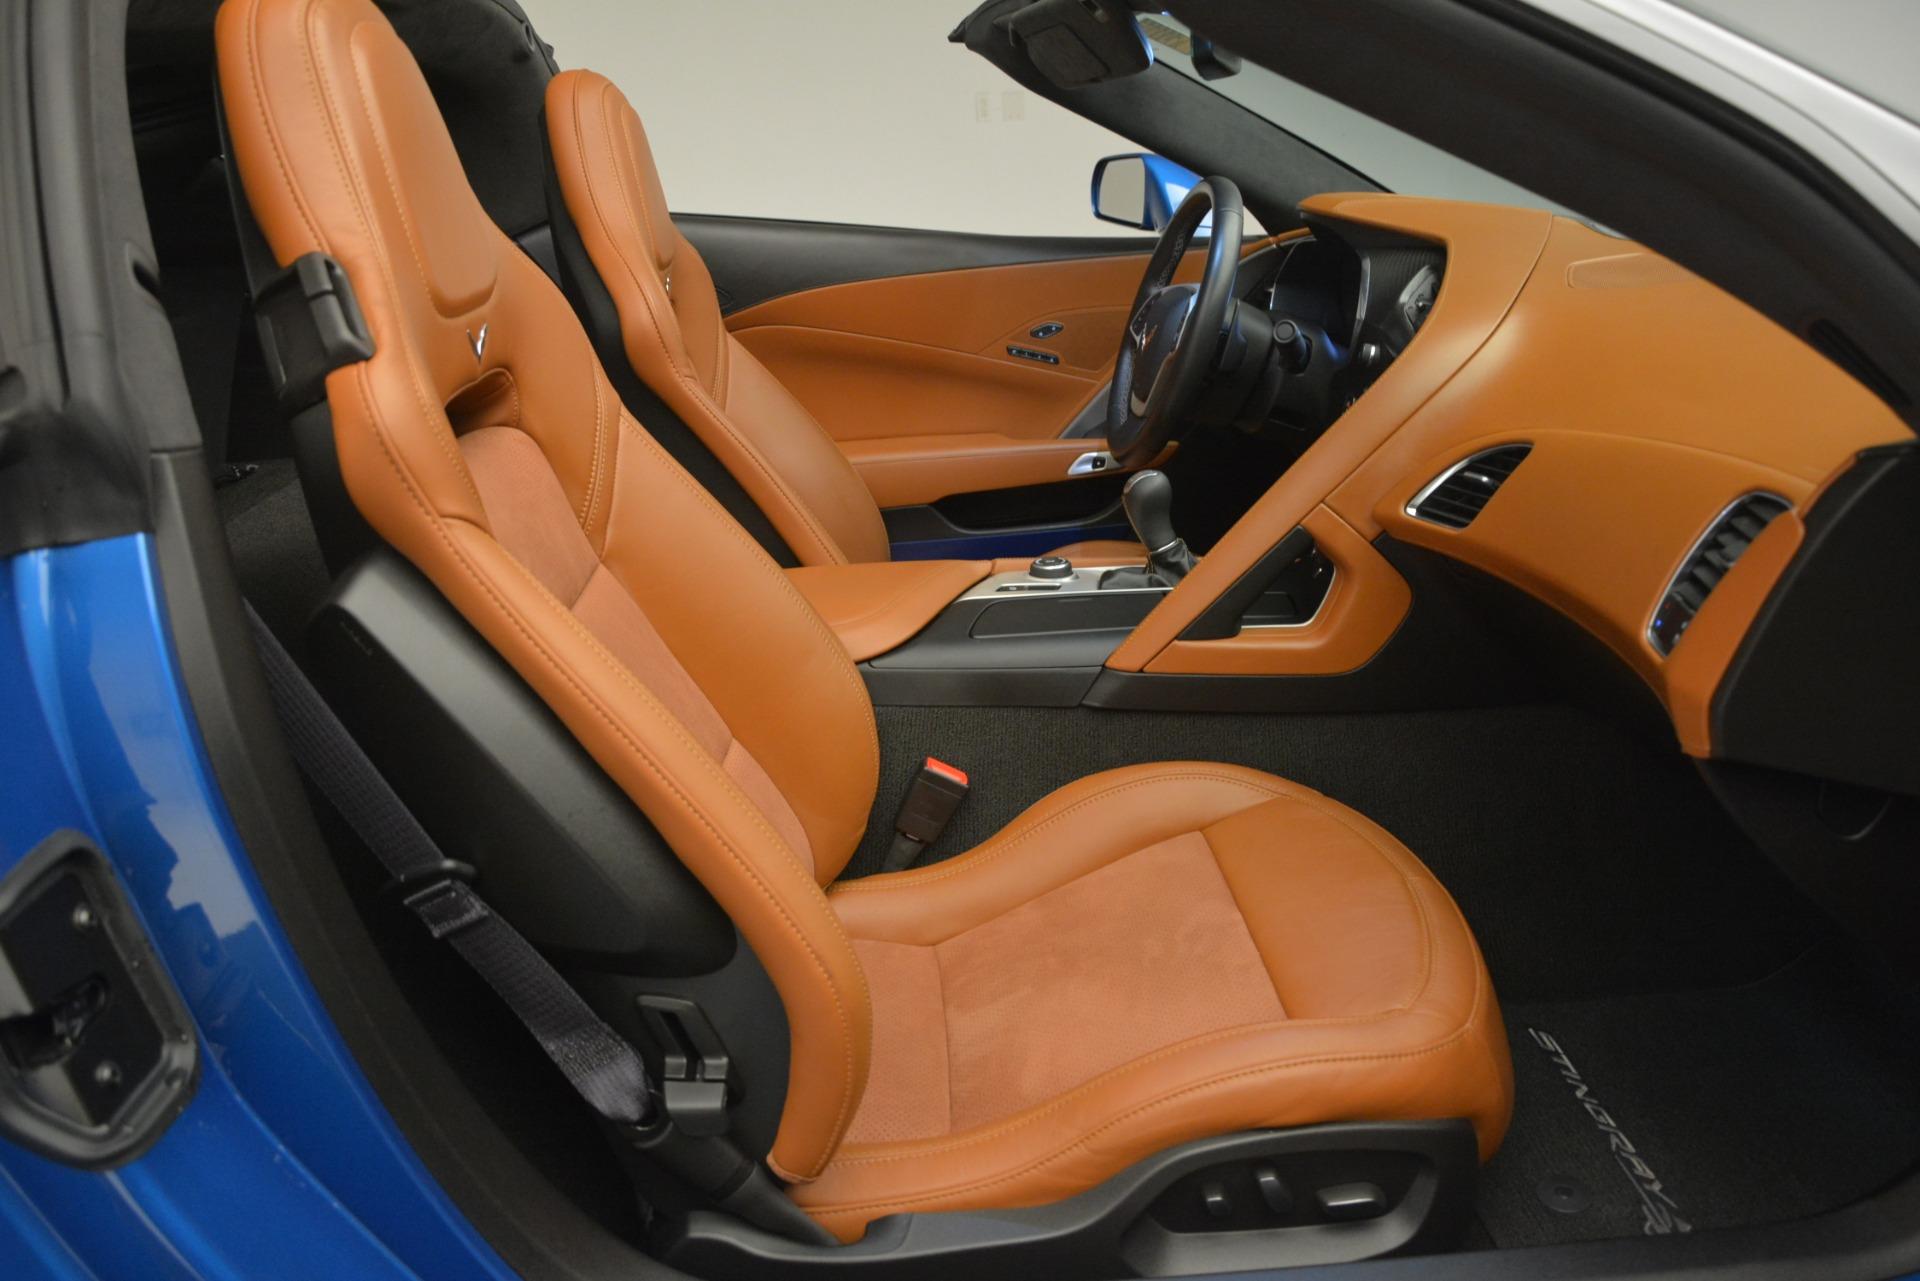 Used 2014 Chevrolet Corvette Stingray Z51 For Sale In Greenwich, CT 2703_p26